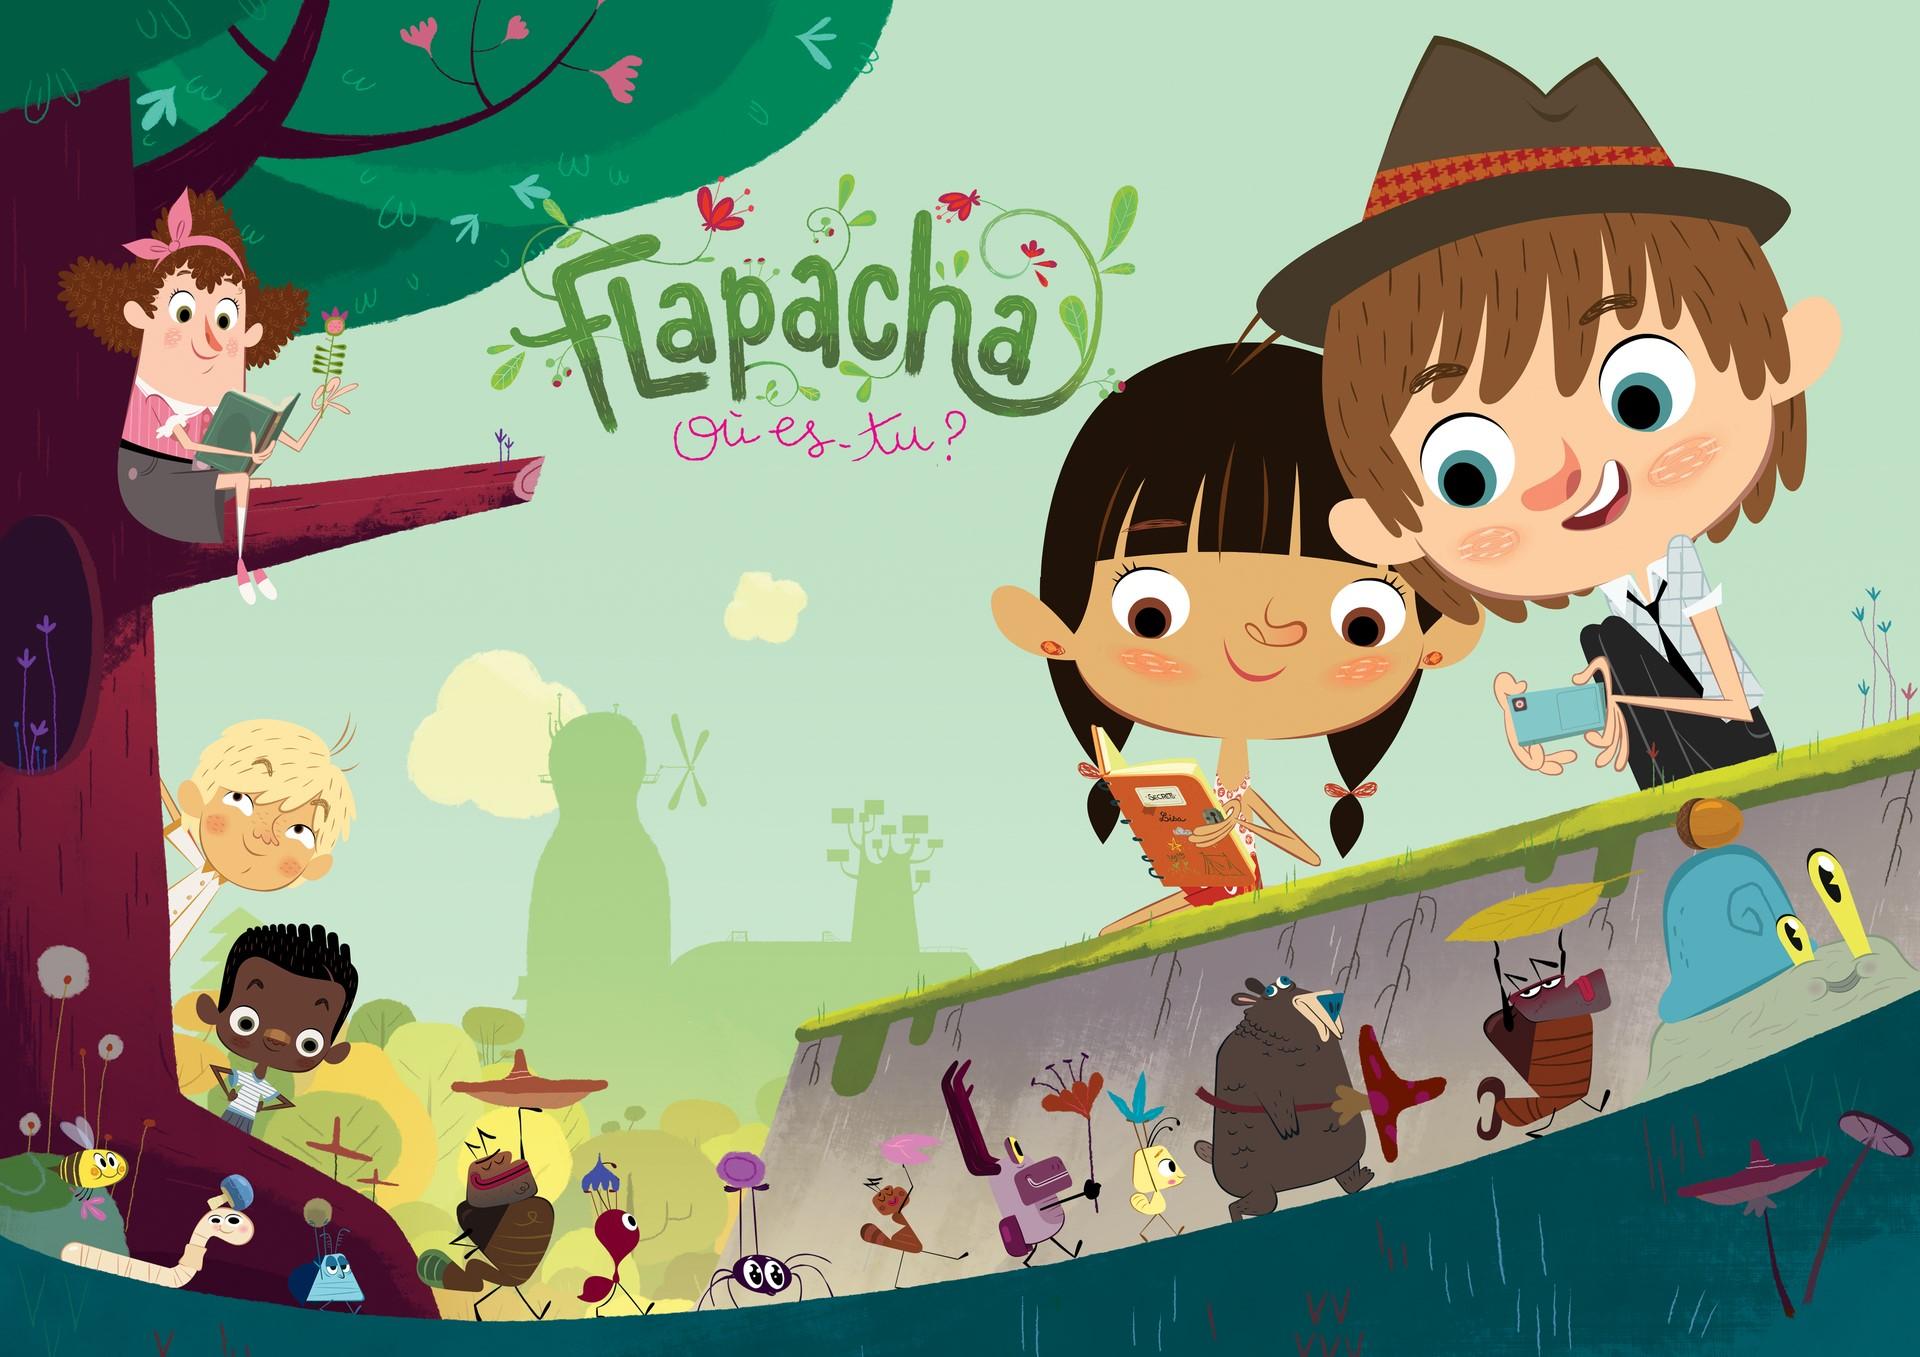 Coloriage Paprika Dessin Anime.Flapacha Ou Es Tu Xilam Animation